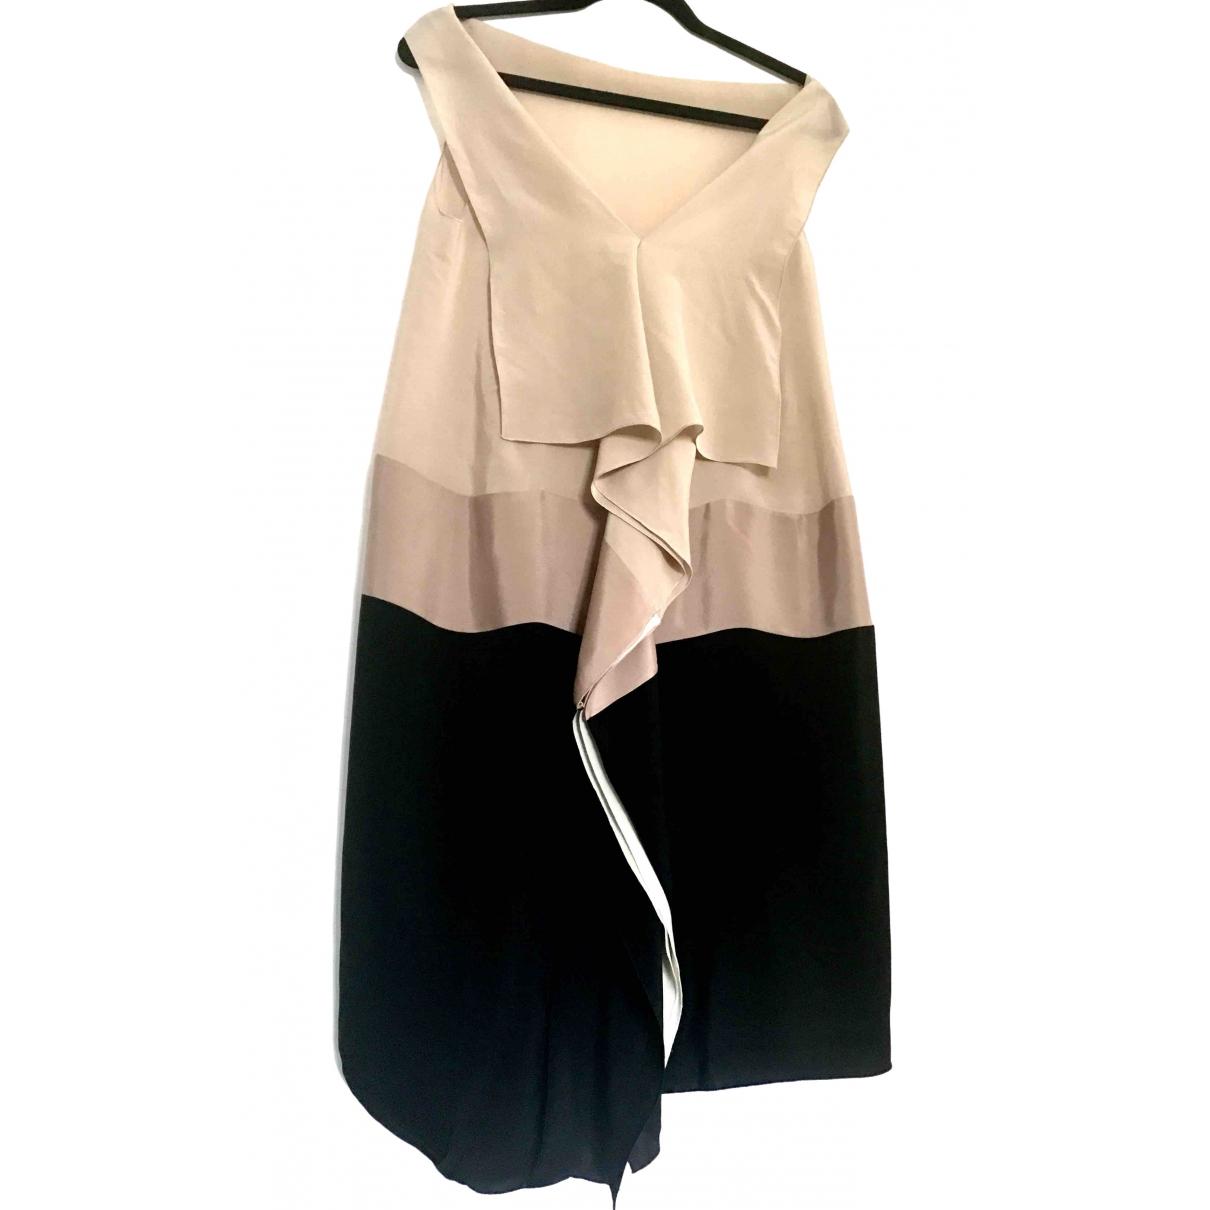 Vionnet \N Silk dress for Women M International